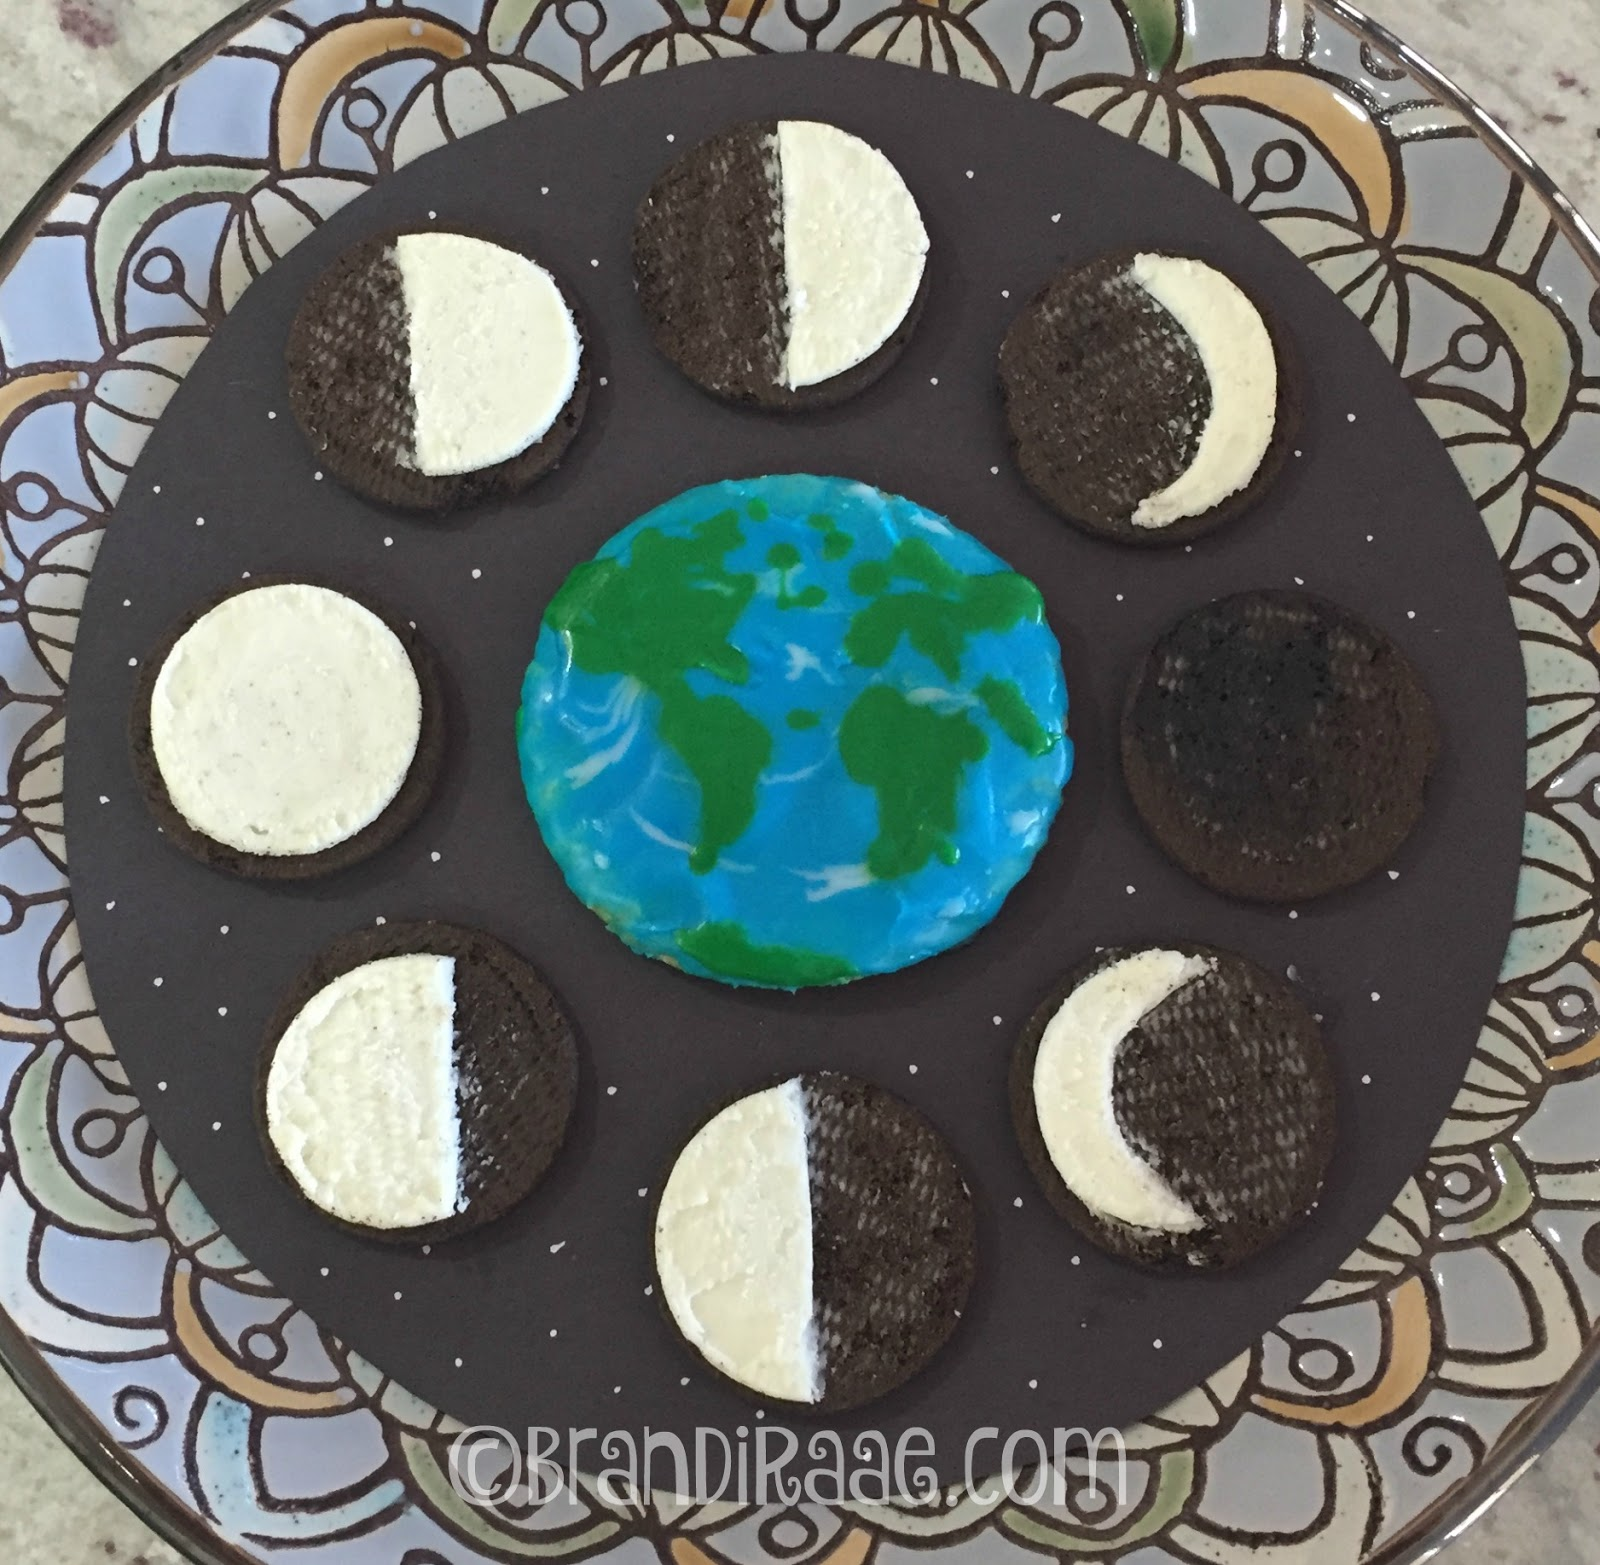 Brandi Raae Cookie Moon Phase Project